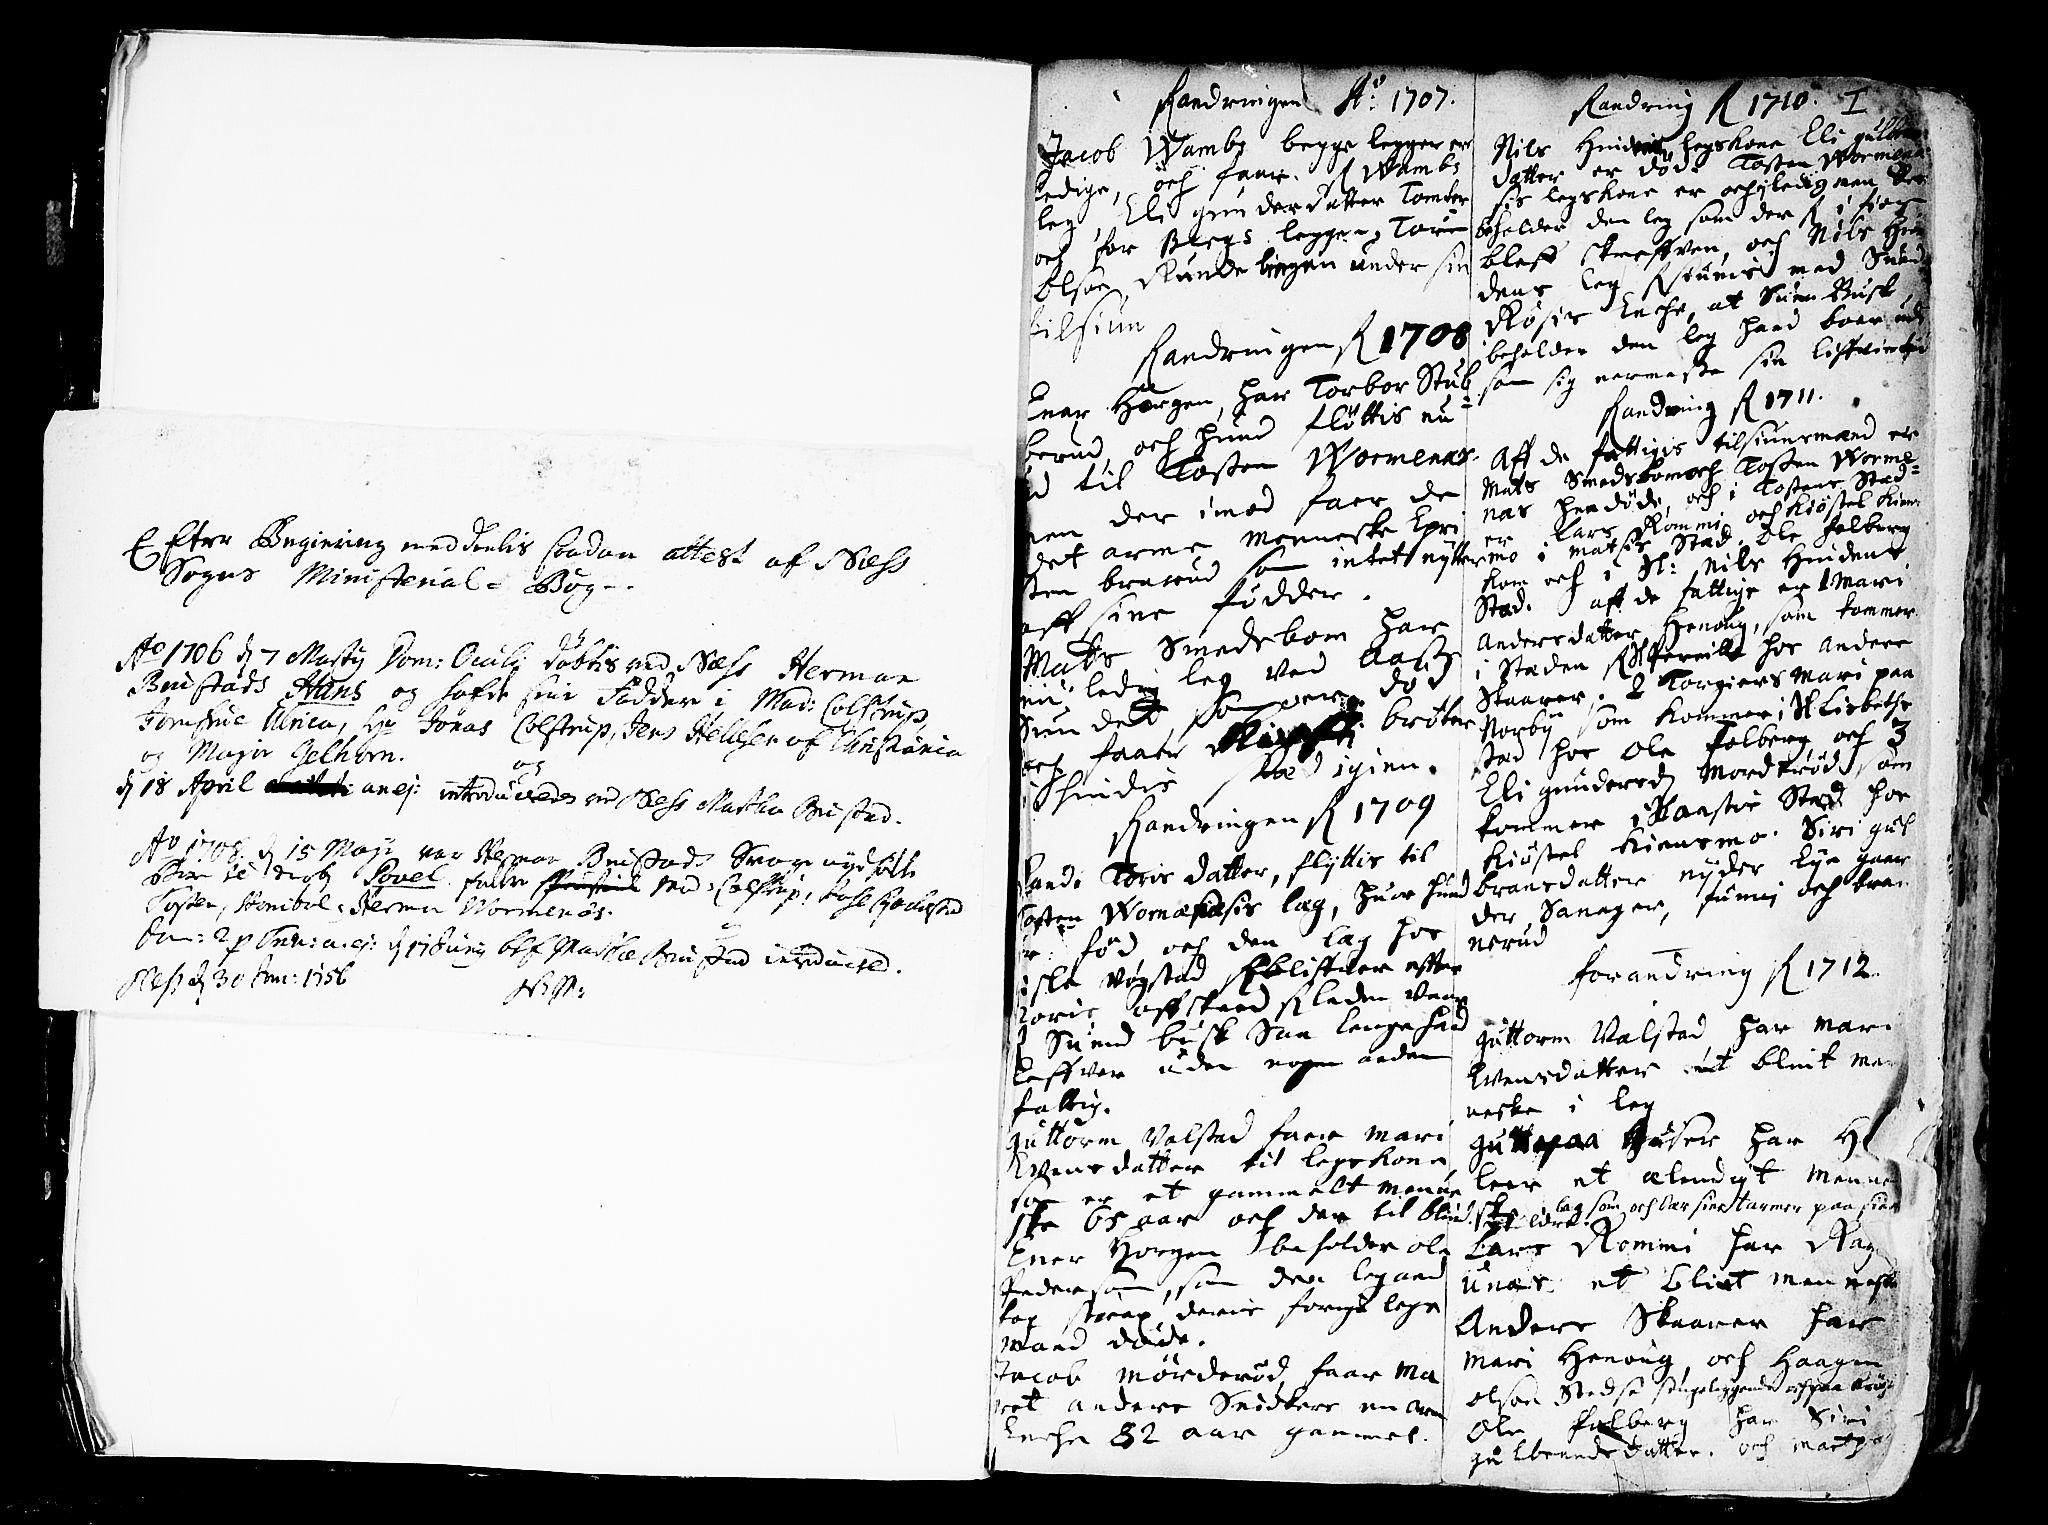 SAO, Nes prestekontor Kirkebøker, F/Fa/L0001: Ministerialbok nr. I 1, 1689-1716